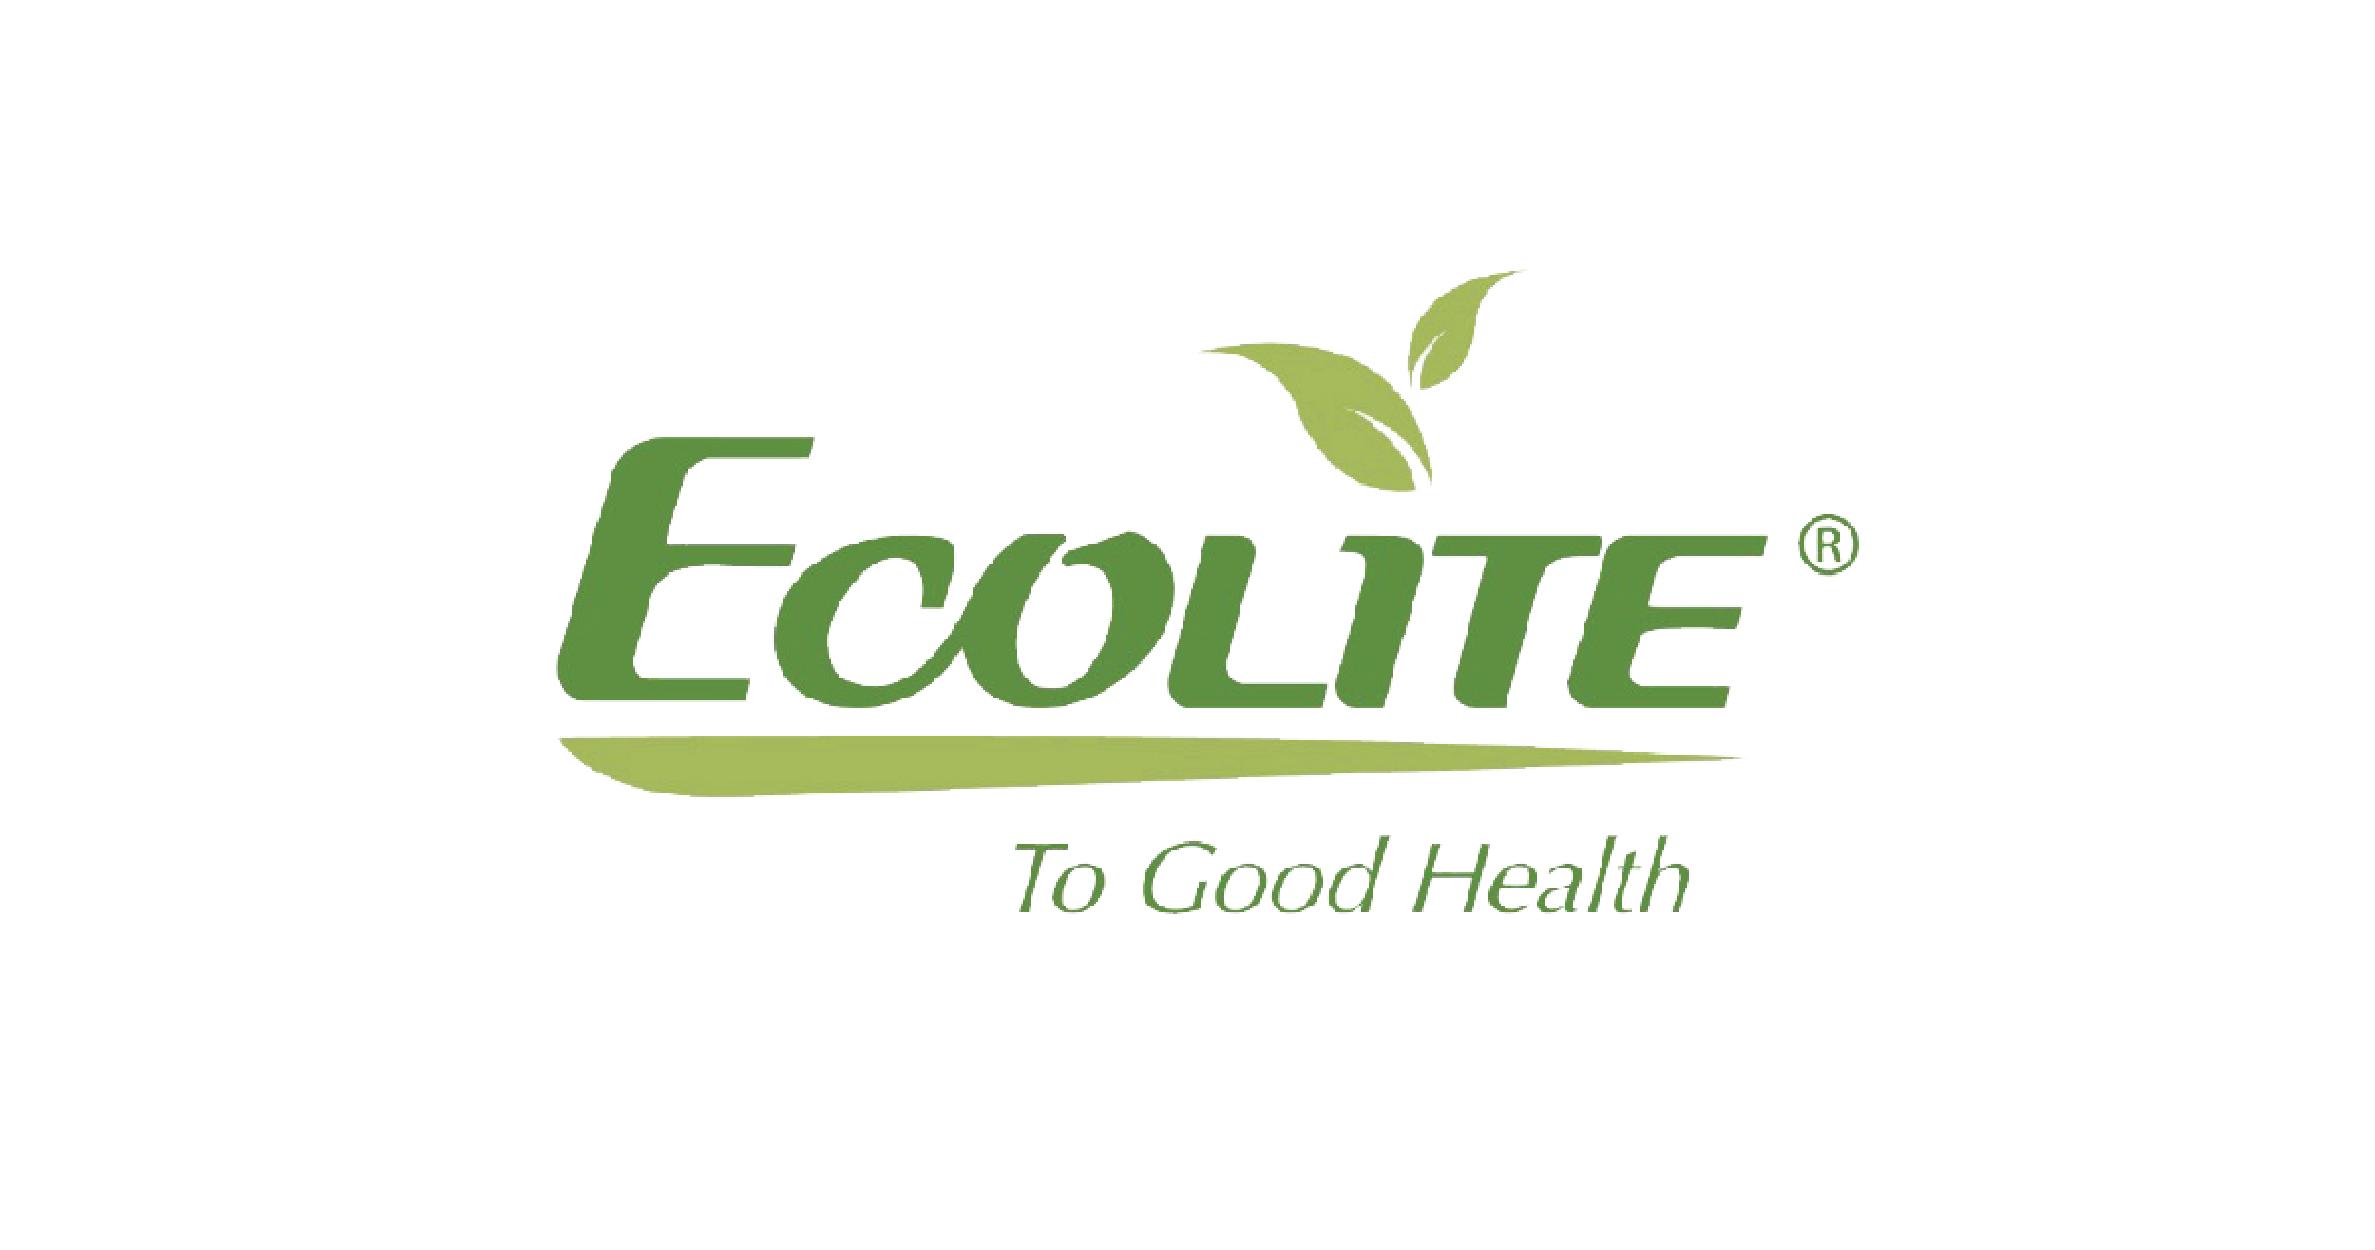 Alpro Pharmacy Oneclick Ecolite